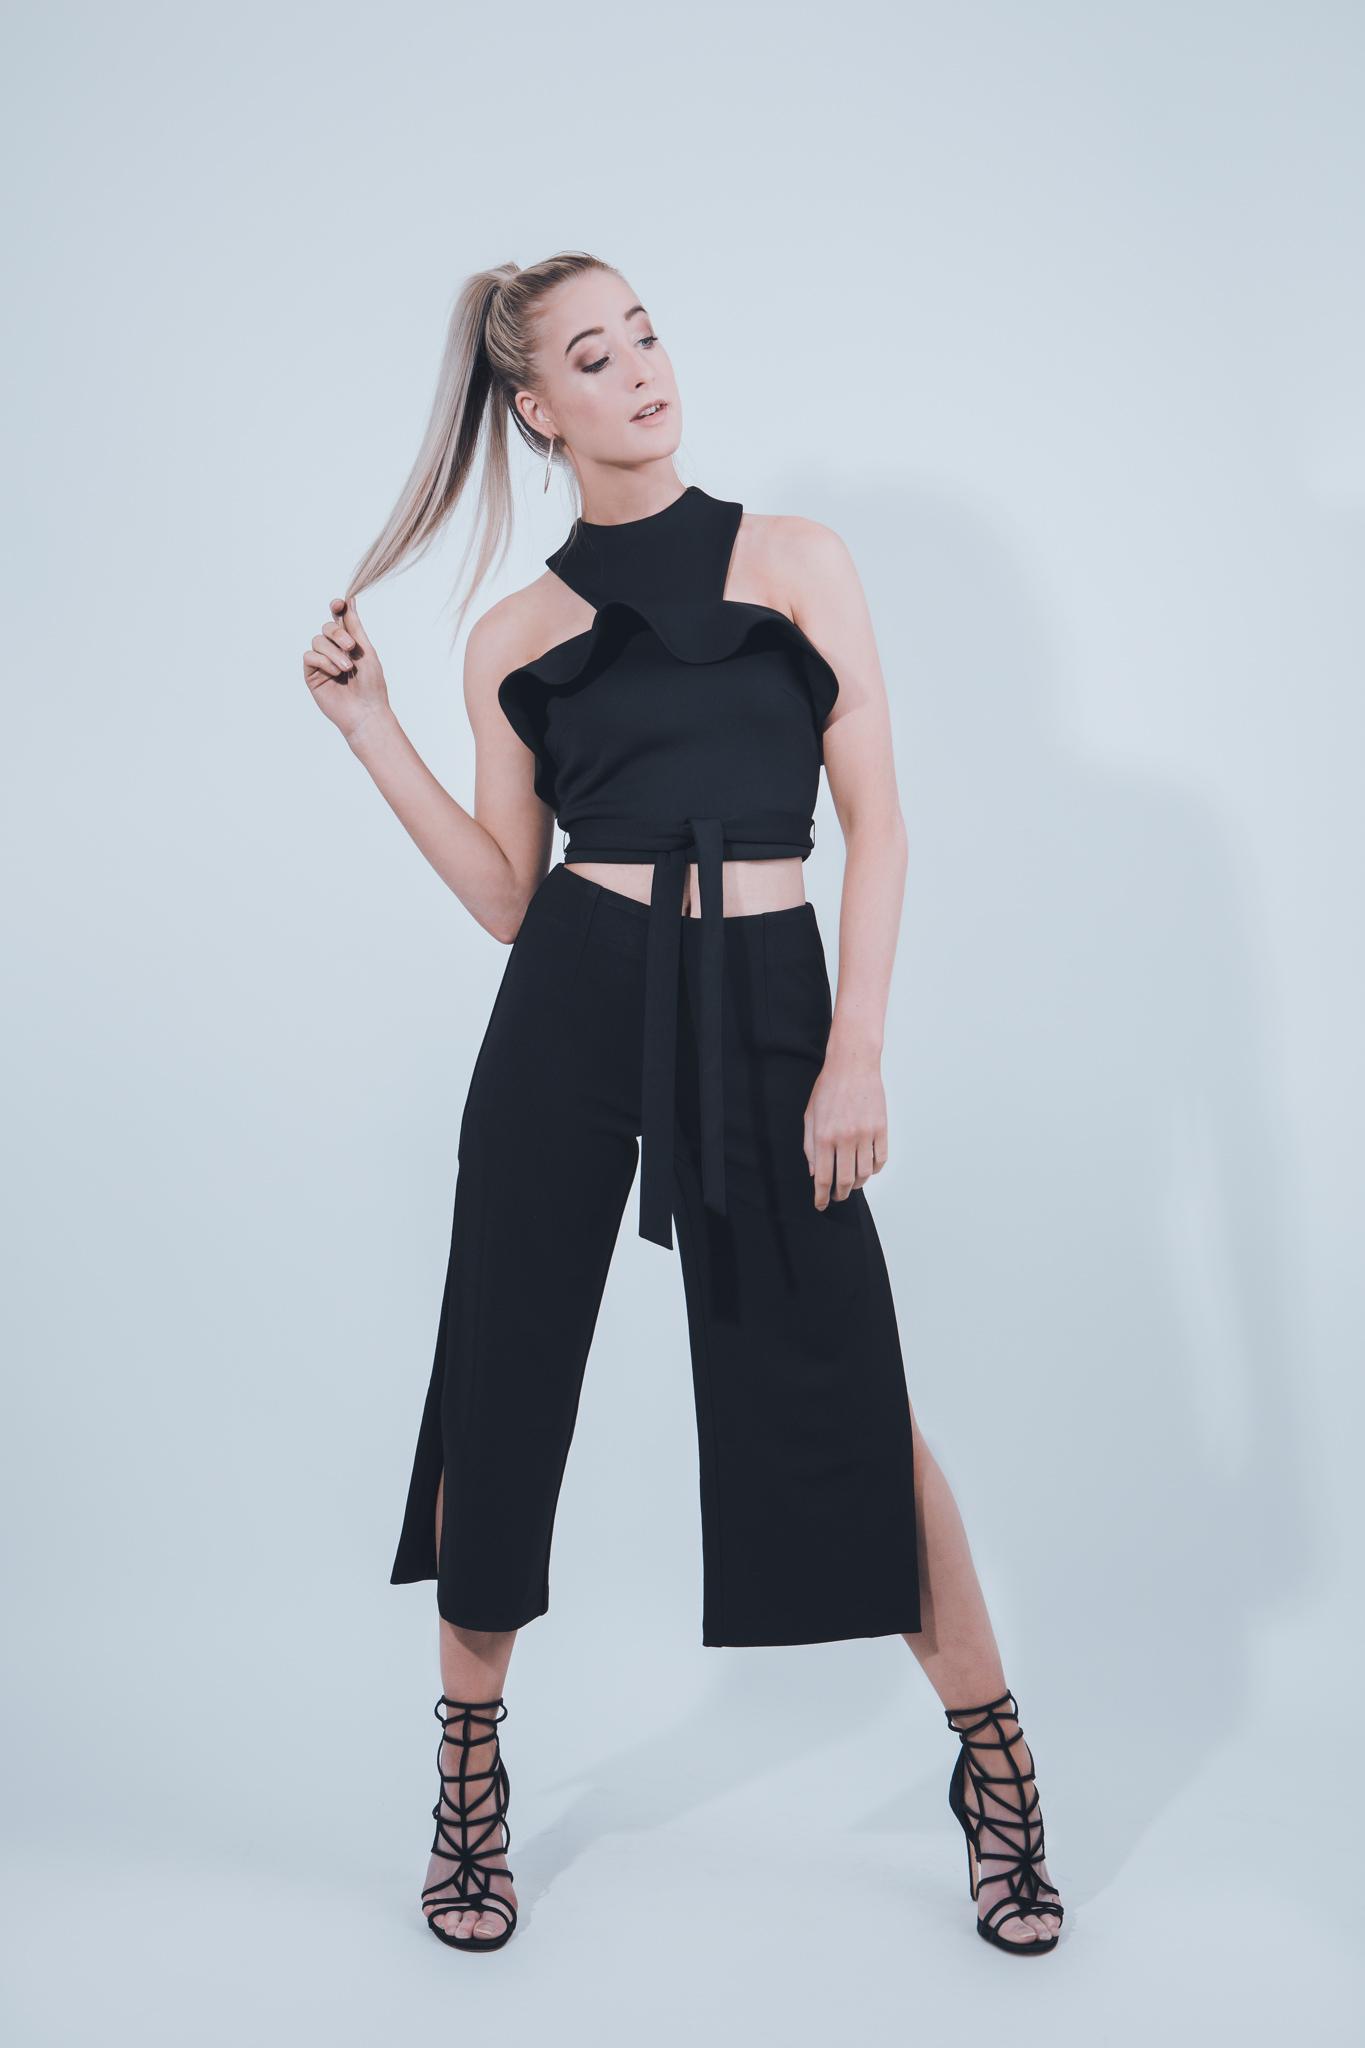 Kimberley Elle Fashion Label - Lookbook Shoot in Melbourne Studio